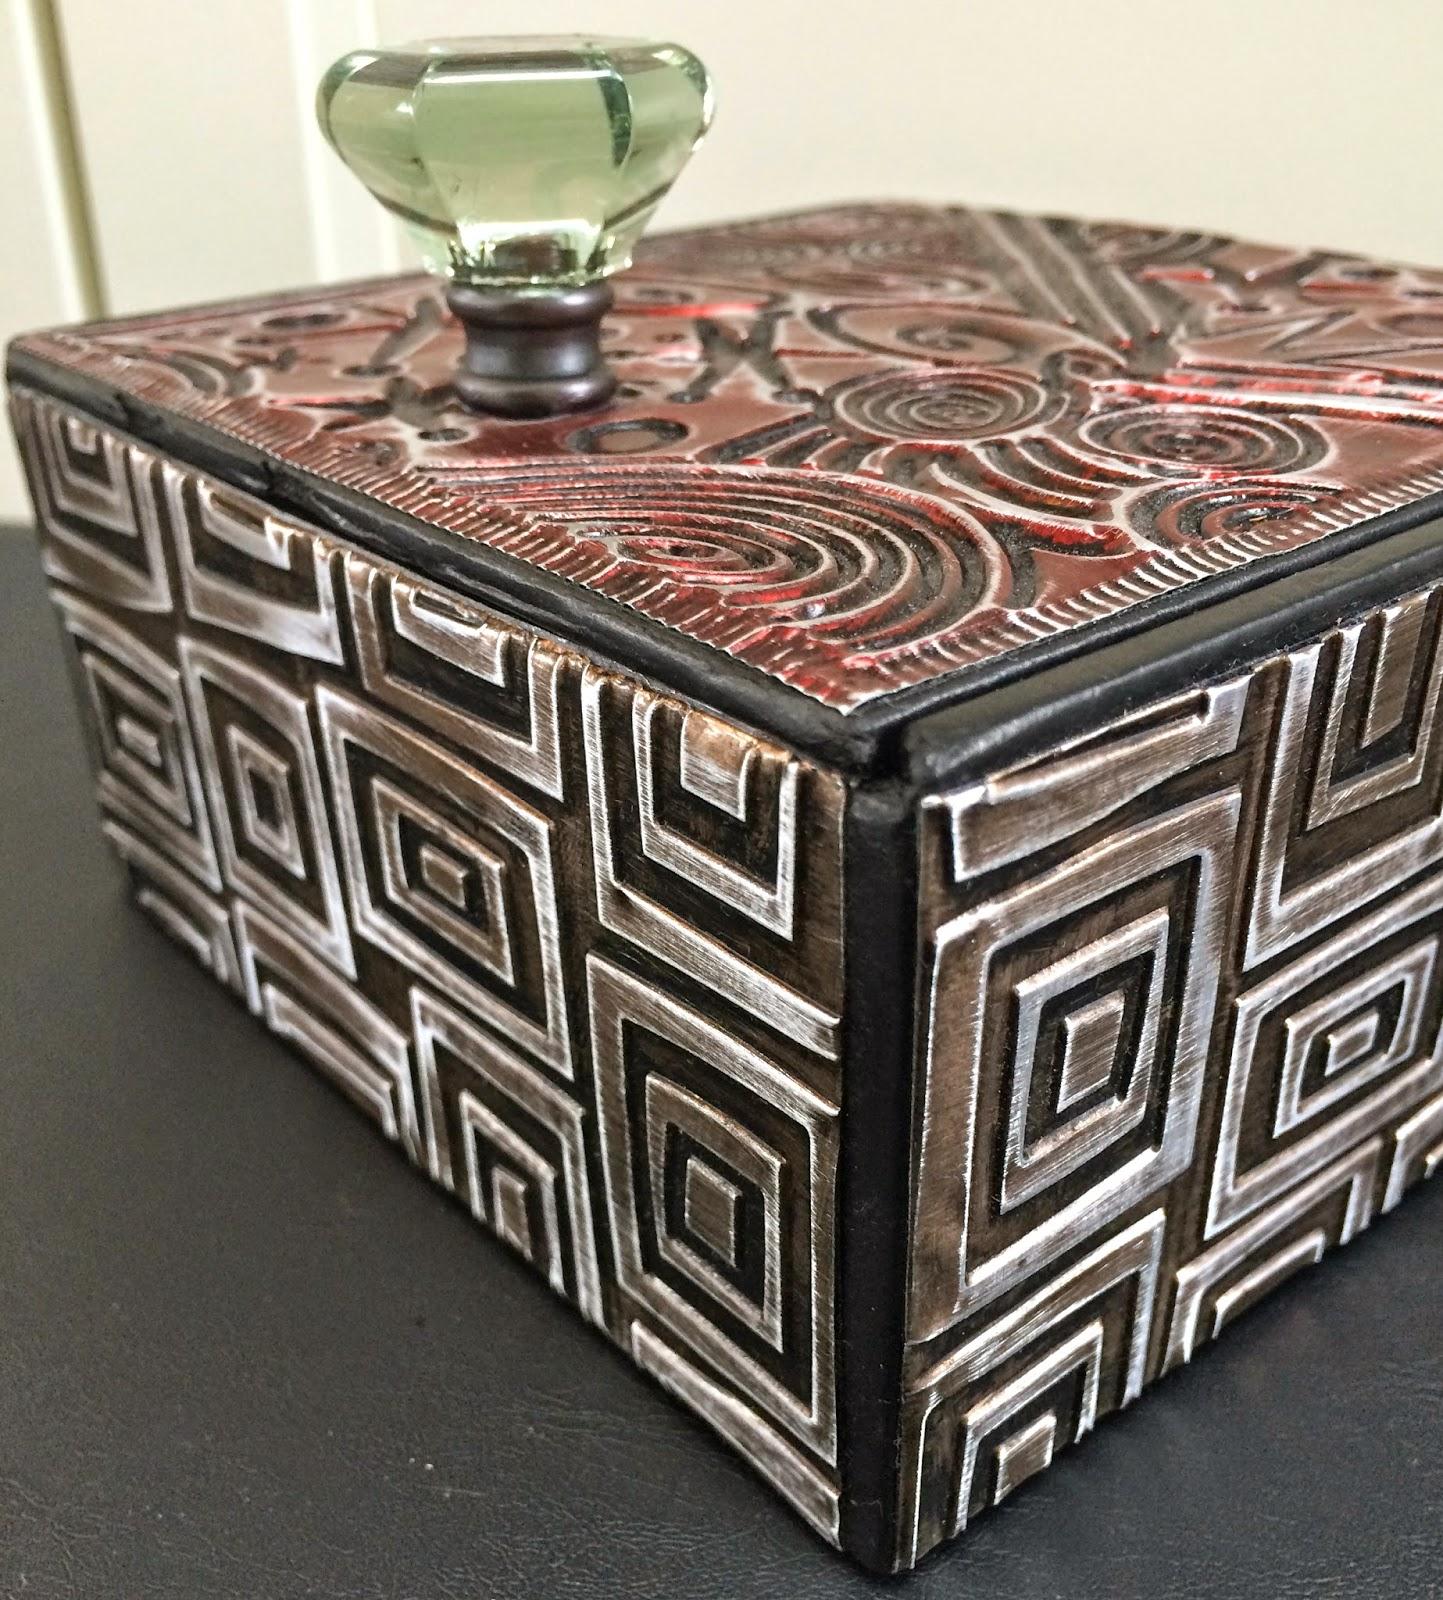 ellen vargo designs Embossed Metal Altered Cigar Box